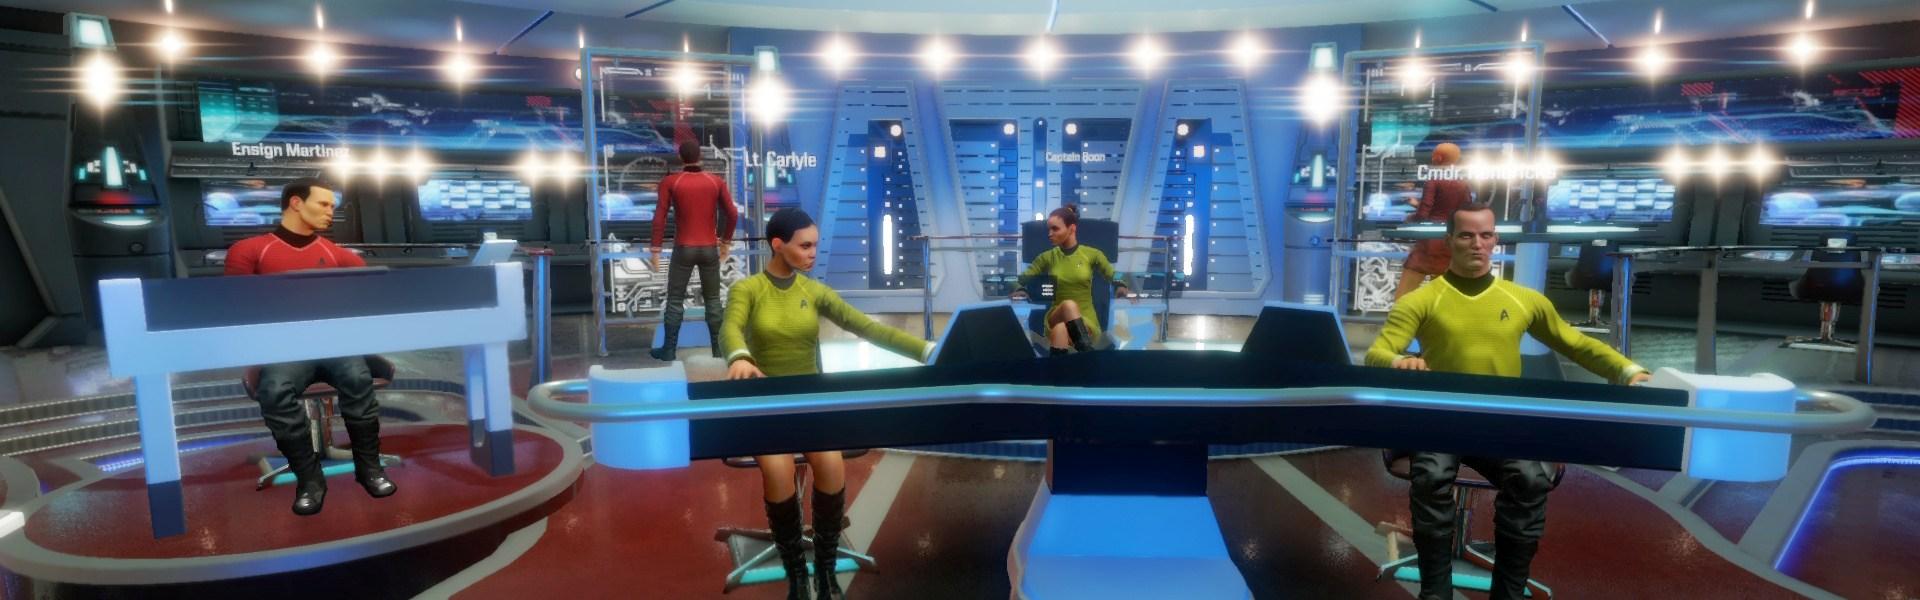 Star Trek: Bridge Crew - The Next Generation (DLC) Steam Key GLOBAL